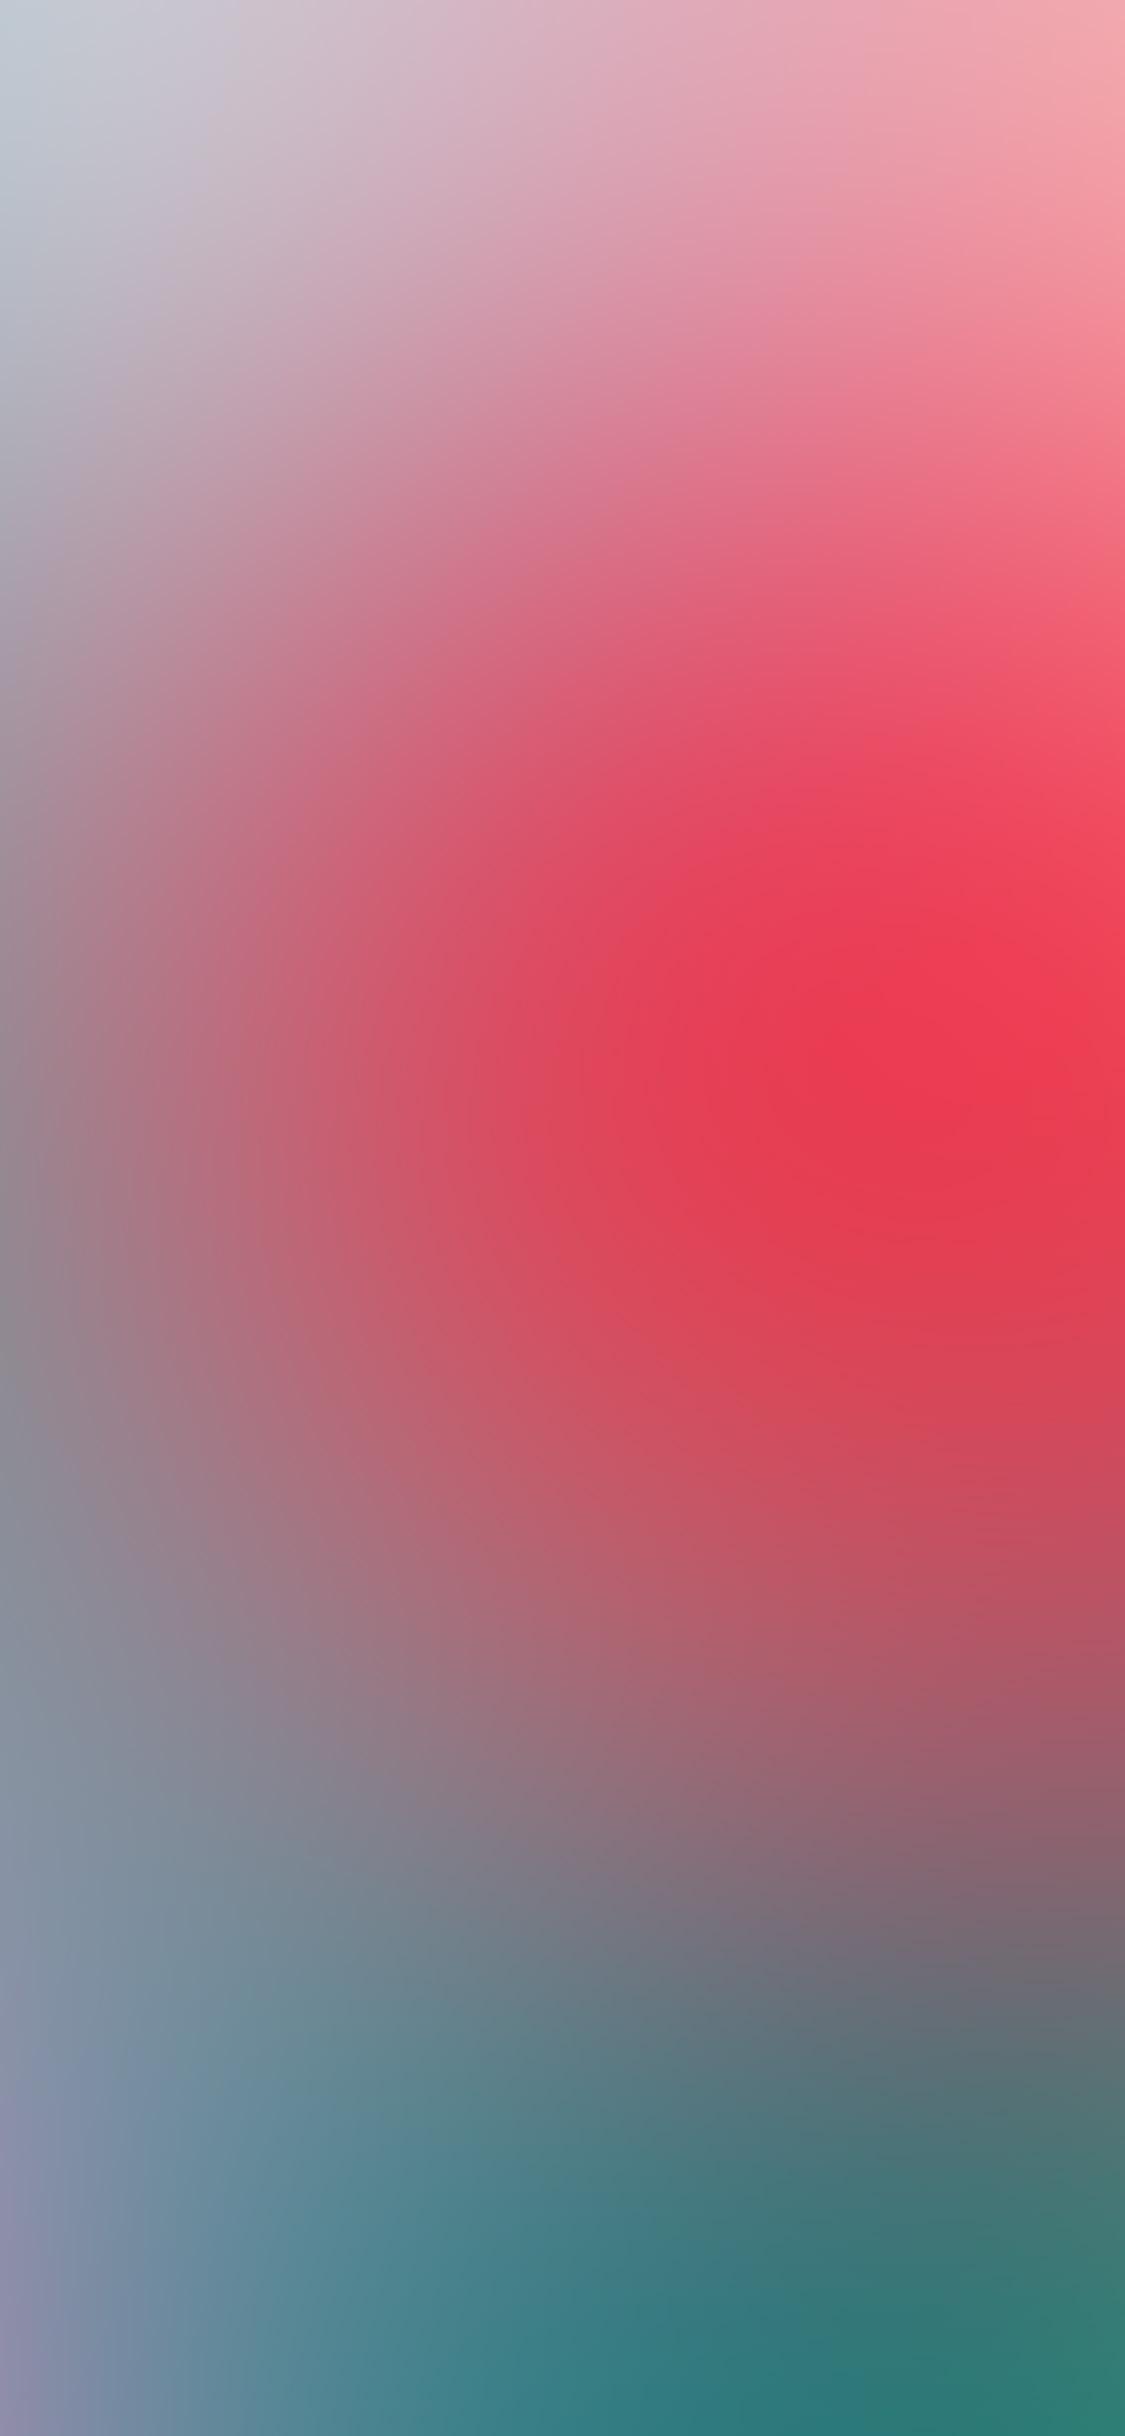 iPhonexpapers.com-Apple-iPhone-wallpaper-so25-blur-gradation-christmas